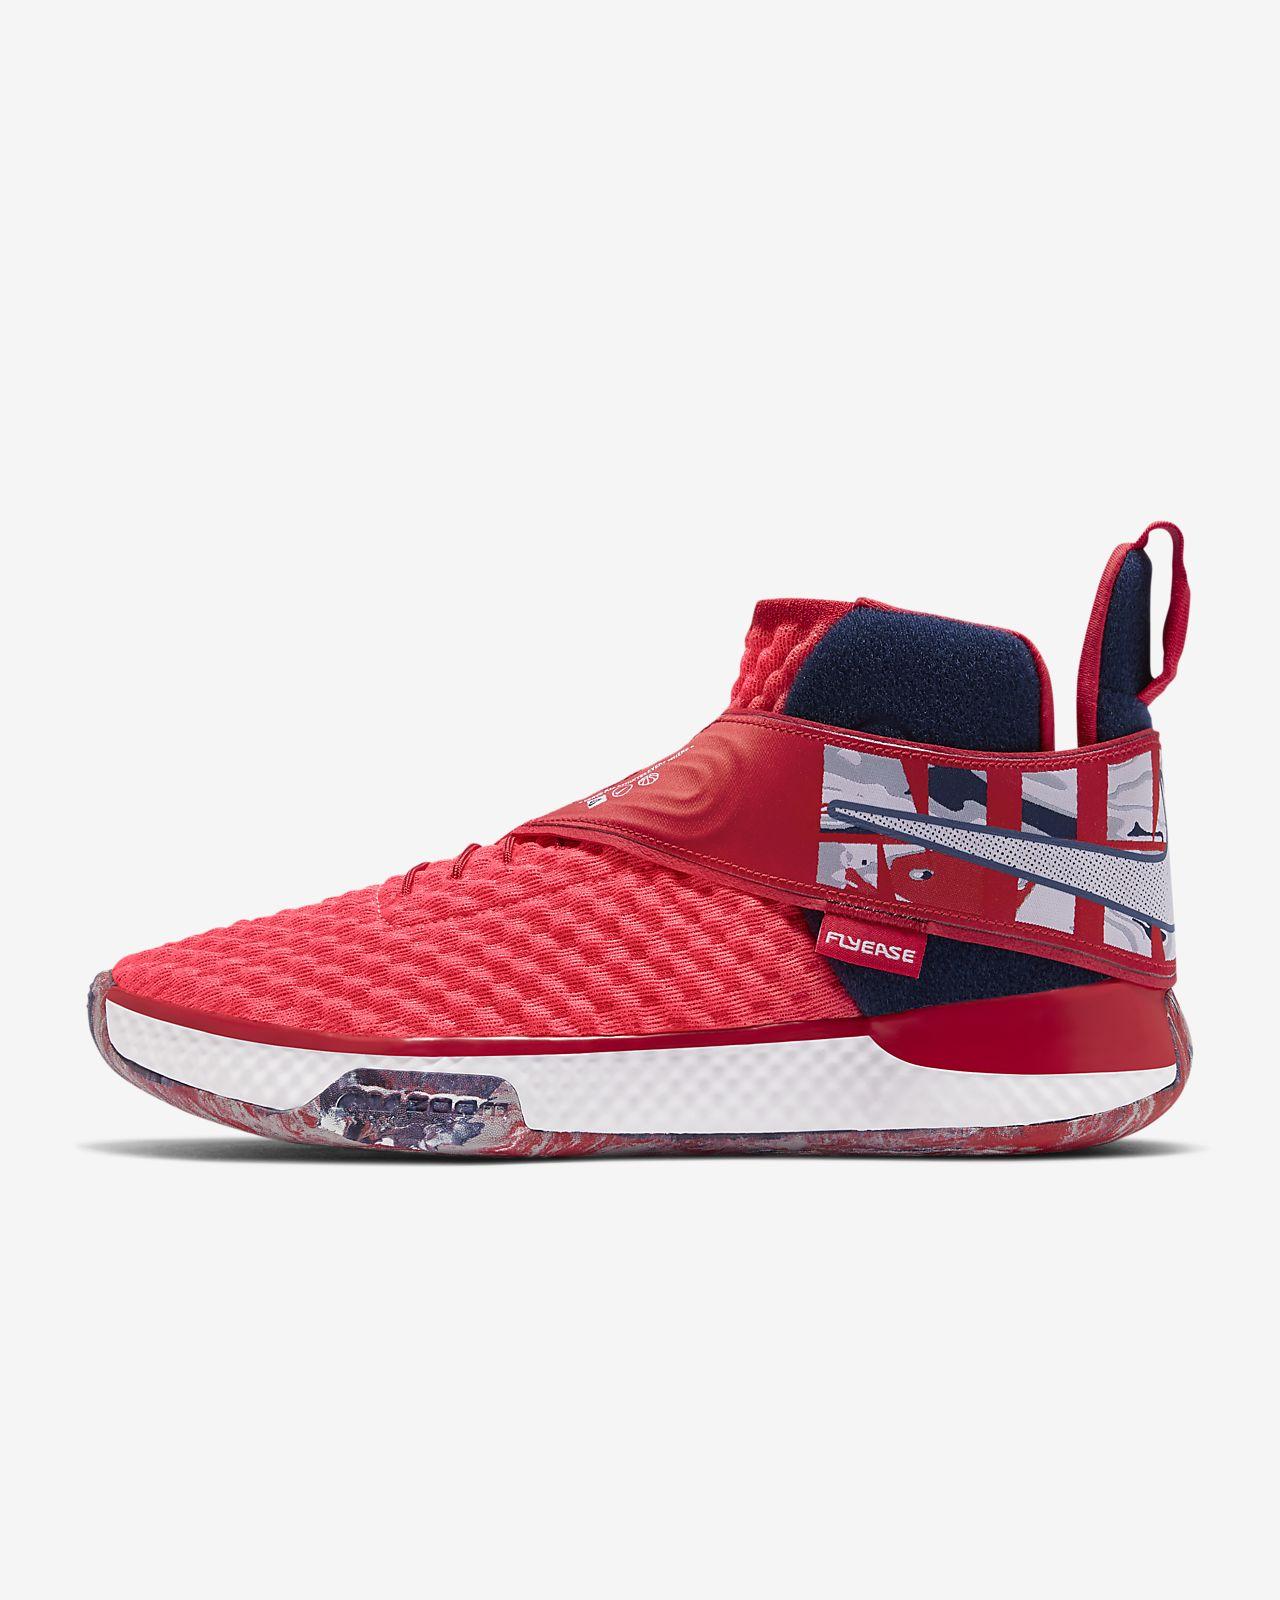 Nike Air Zoom UNVRS FlyEase Basketball Shoe